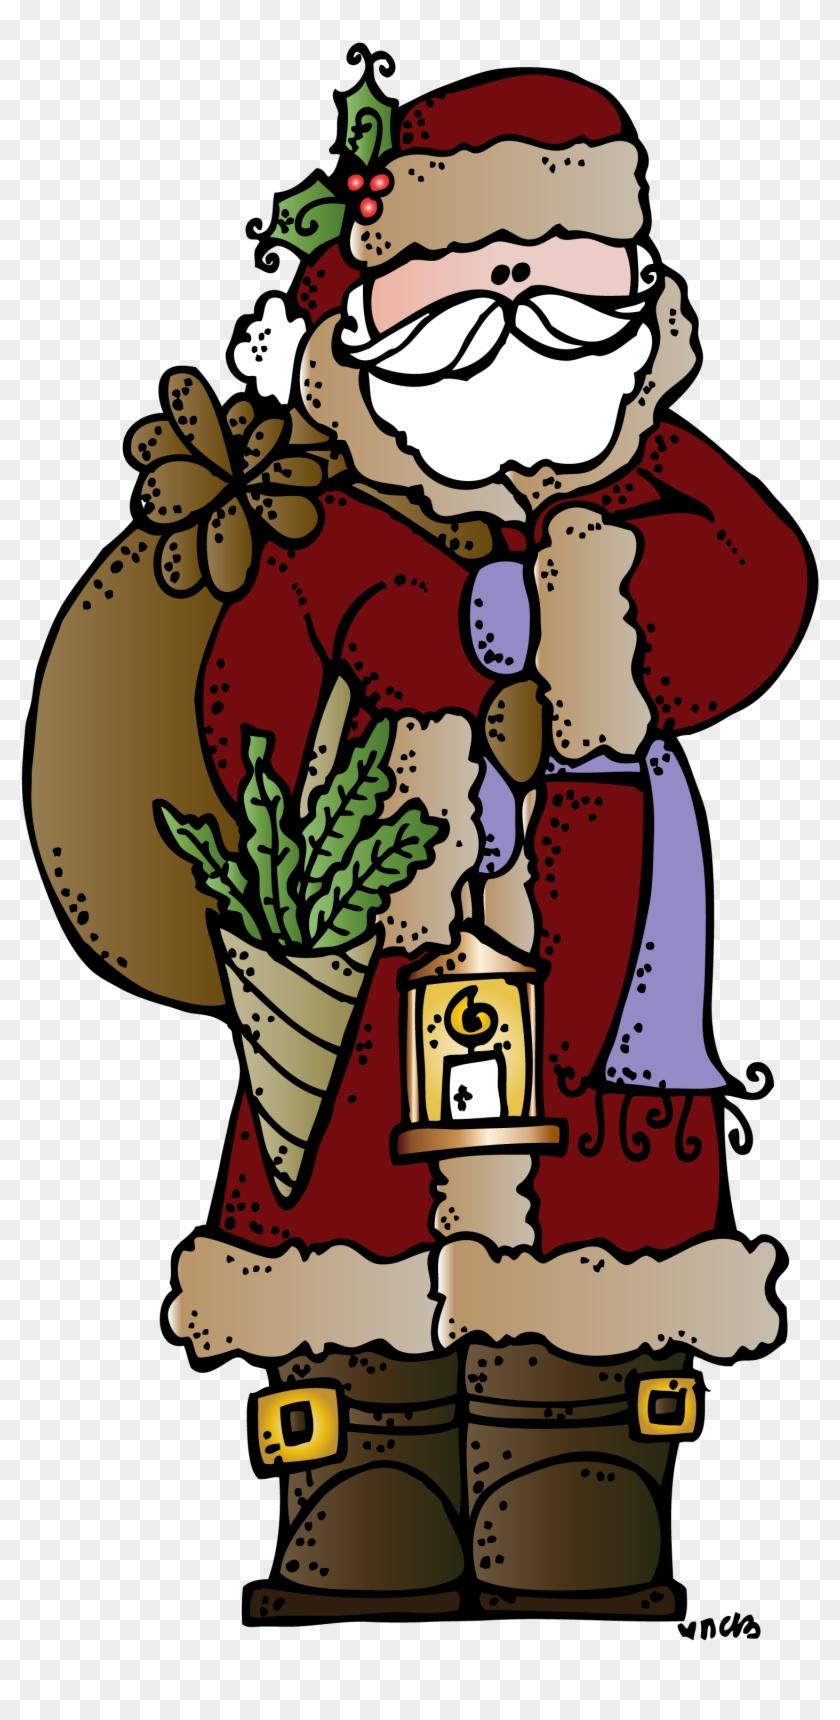 Crayons - Melonheadz Christmas Clipart #1299591